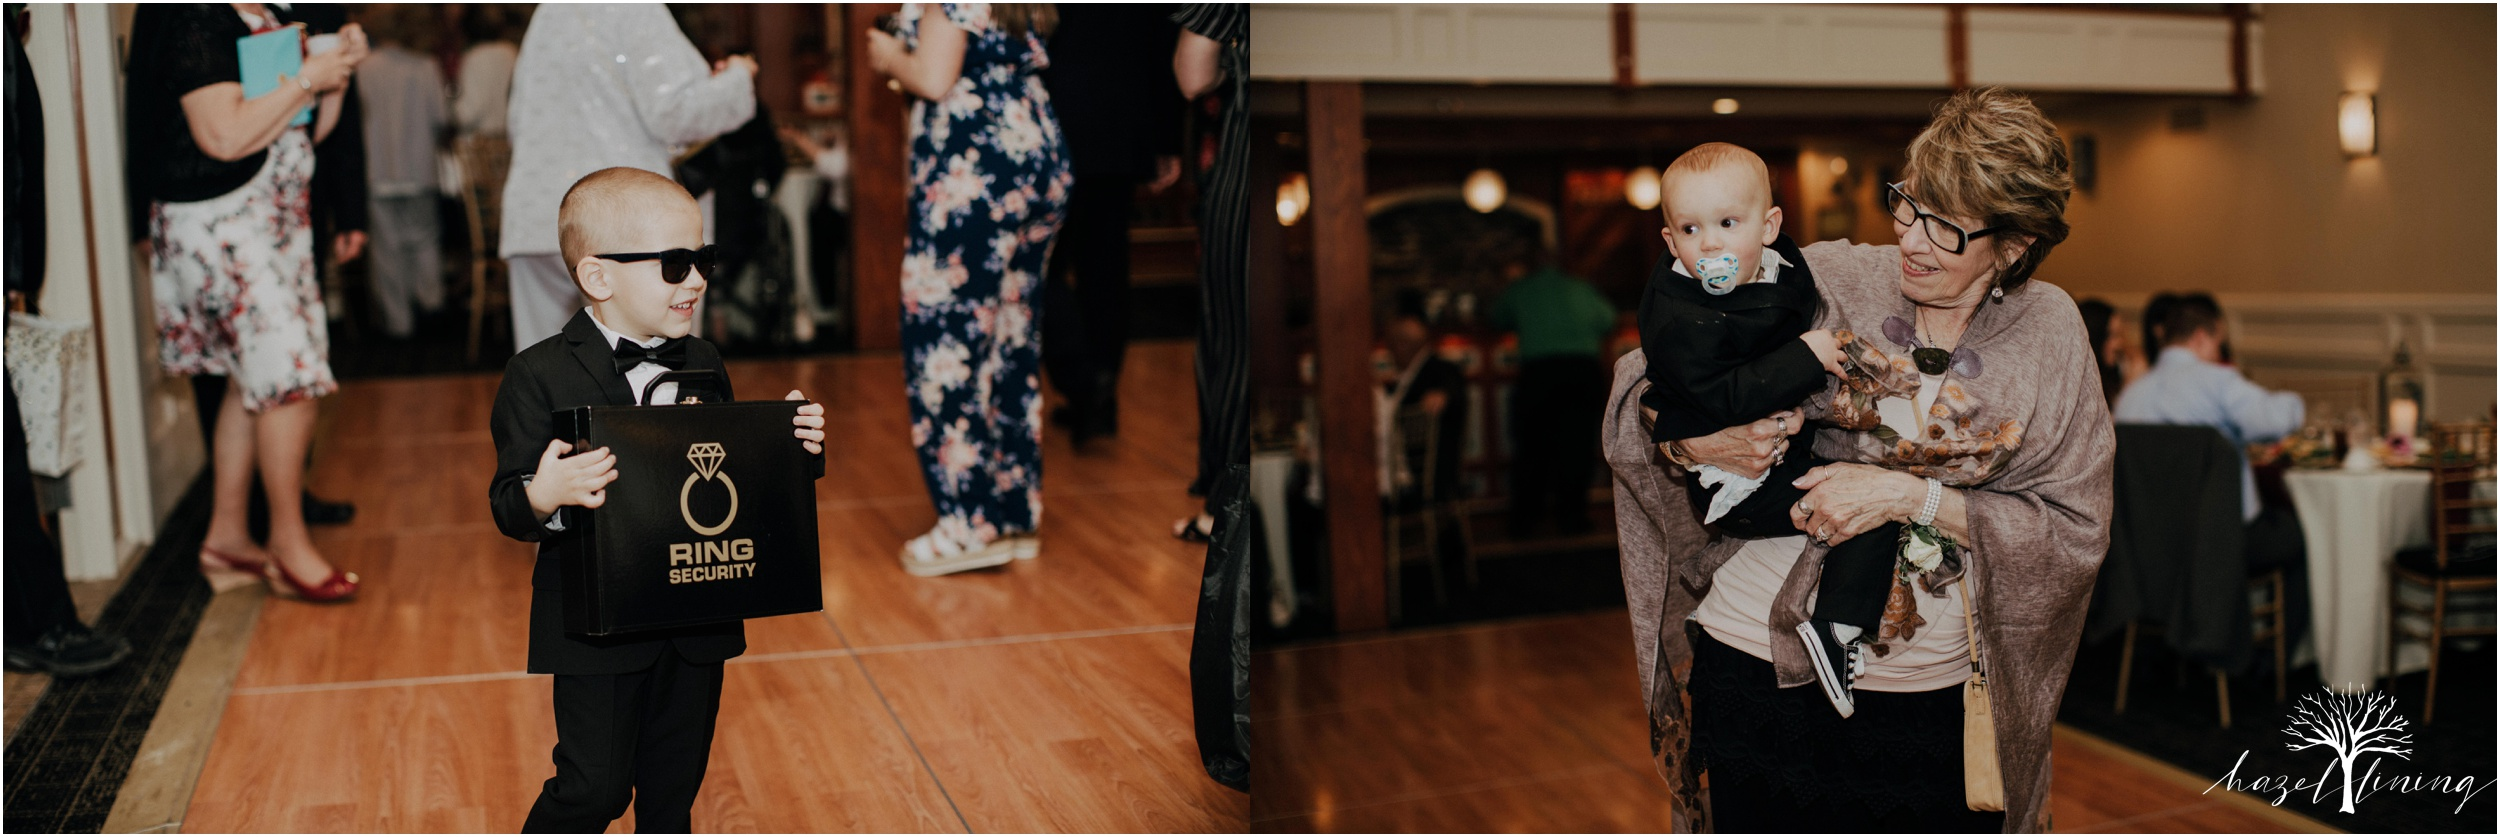 liz-blair-loft-at-sweetwater-cc-pennsburg-pa-spring-wedding-hazel-lining-photography-destination-elopement-wedding-engagement-photography-year-in-review_0192.jpg